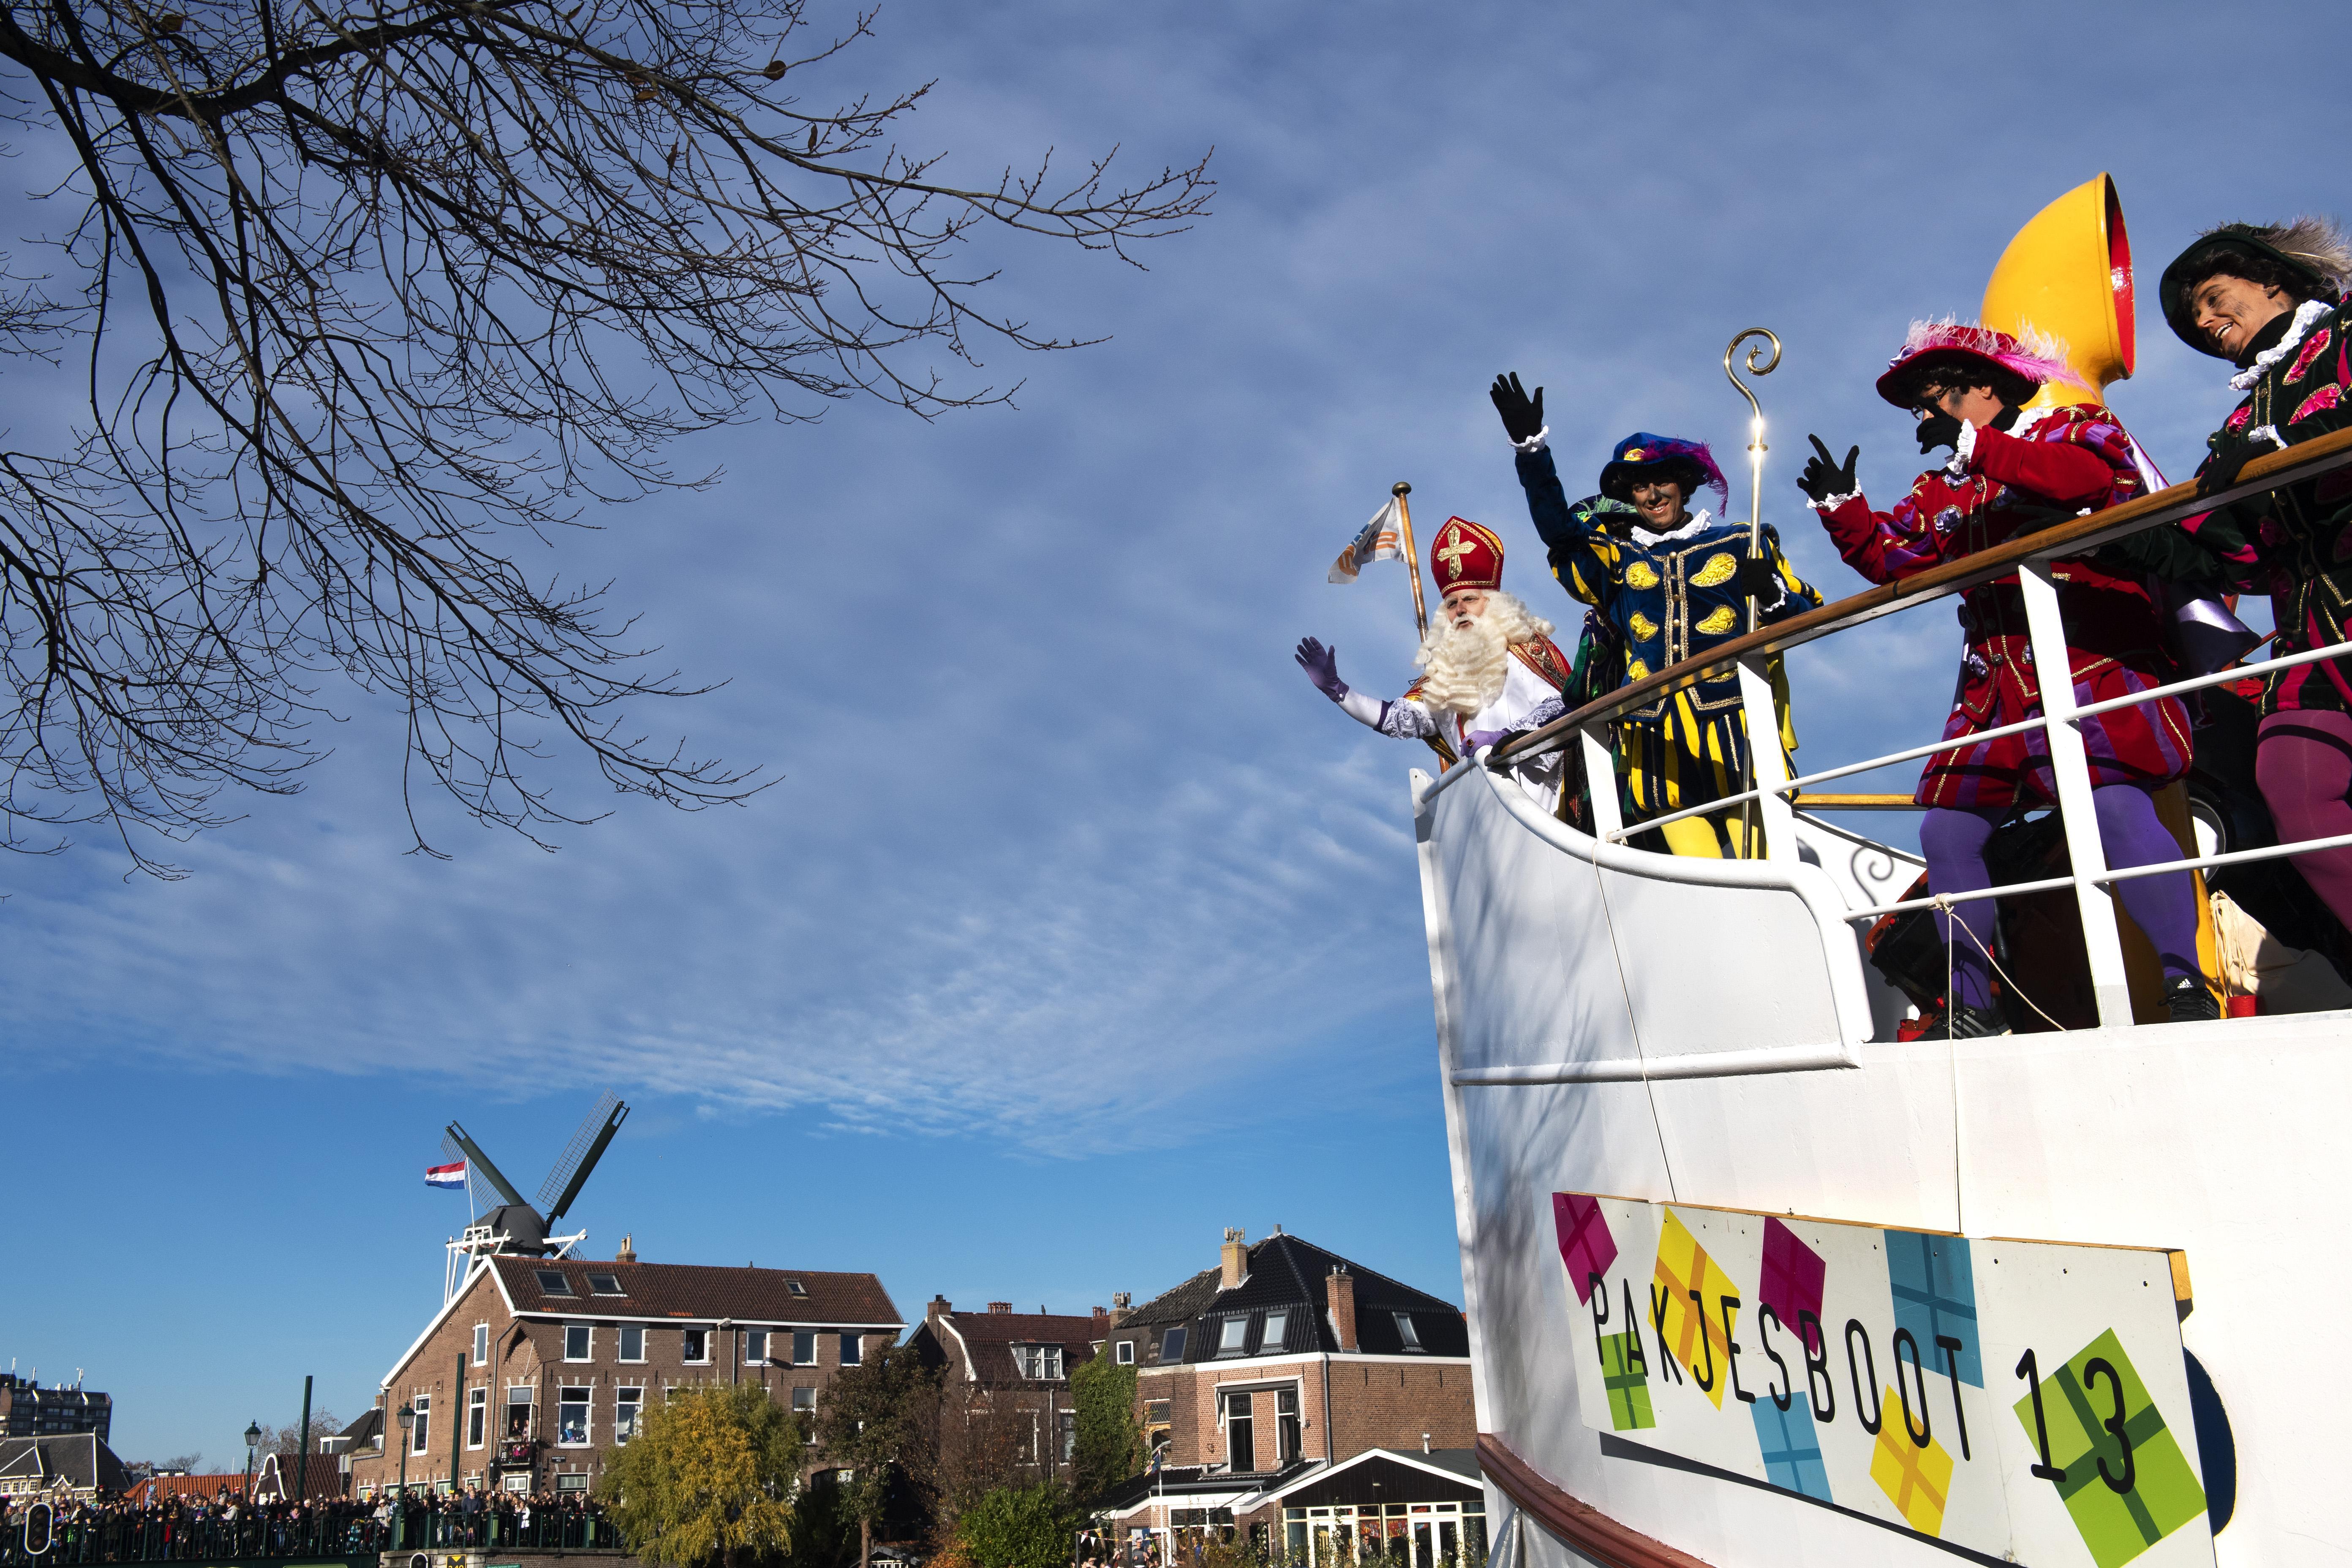 Warm welkom voor Sinterklaas in koud Haarlem